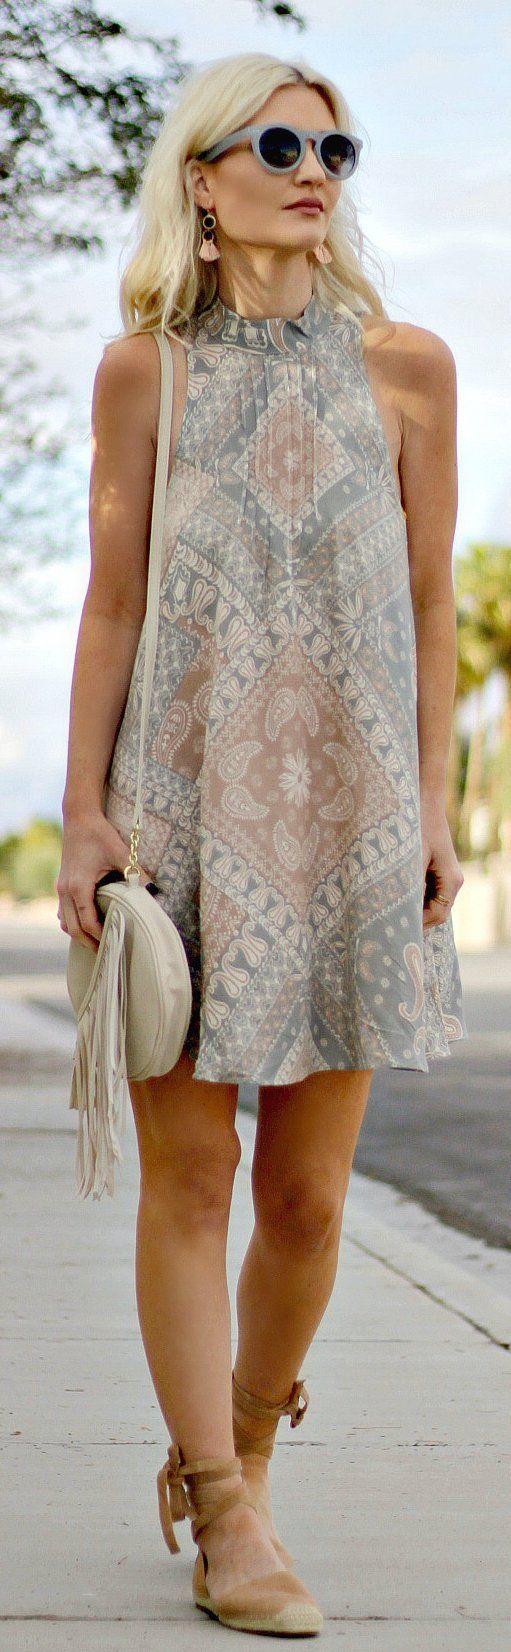 Printed Sleeveless Dress / Cream Leather Shoulder Bag / Brown Pumps